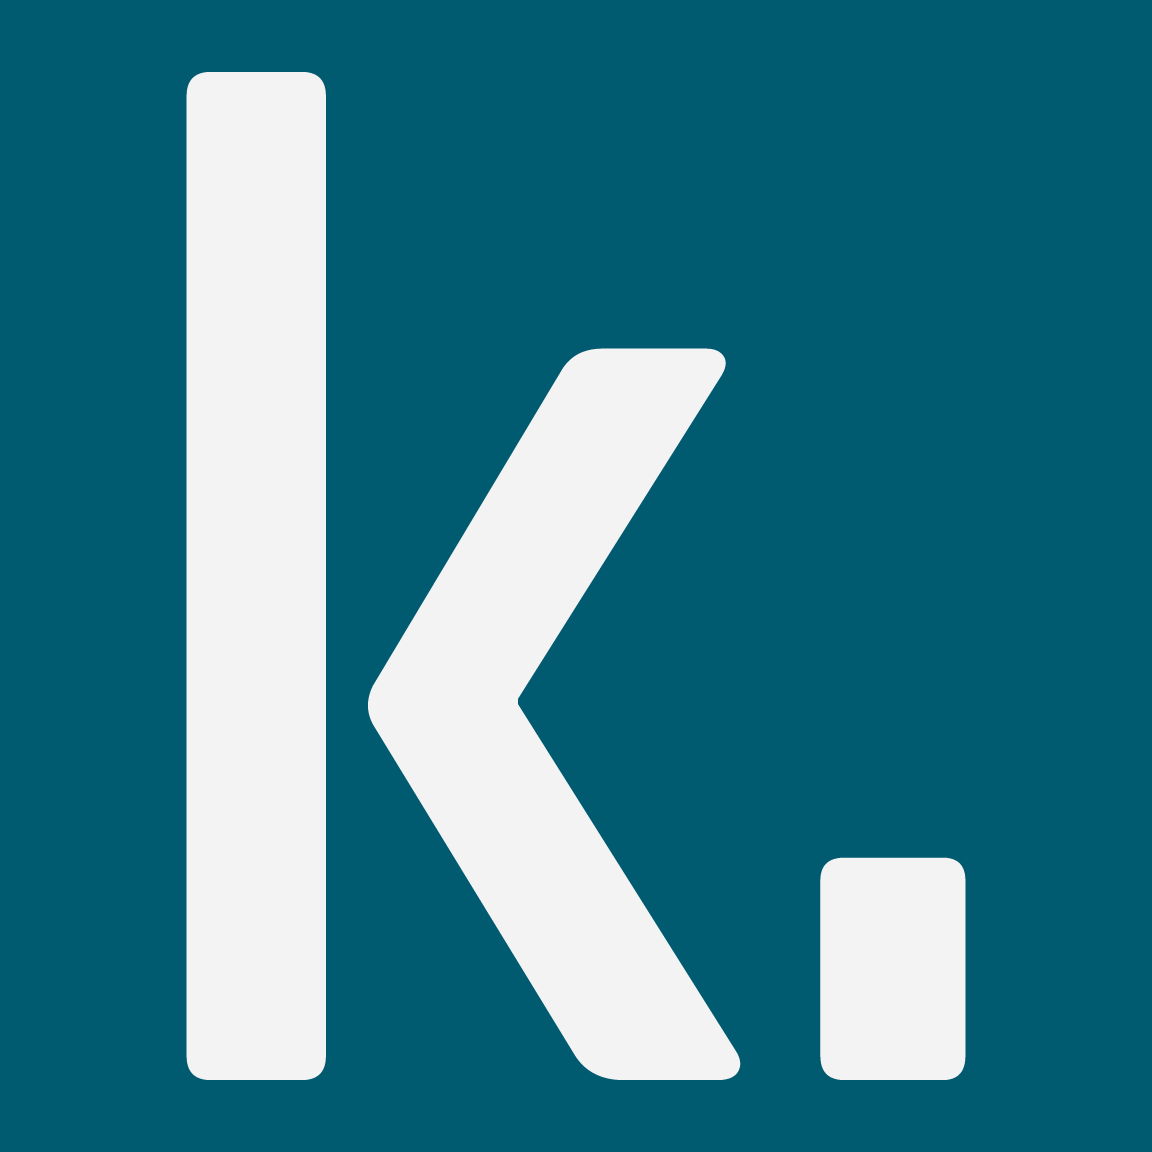 Knedia logo